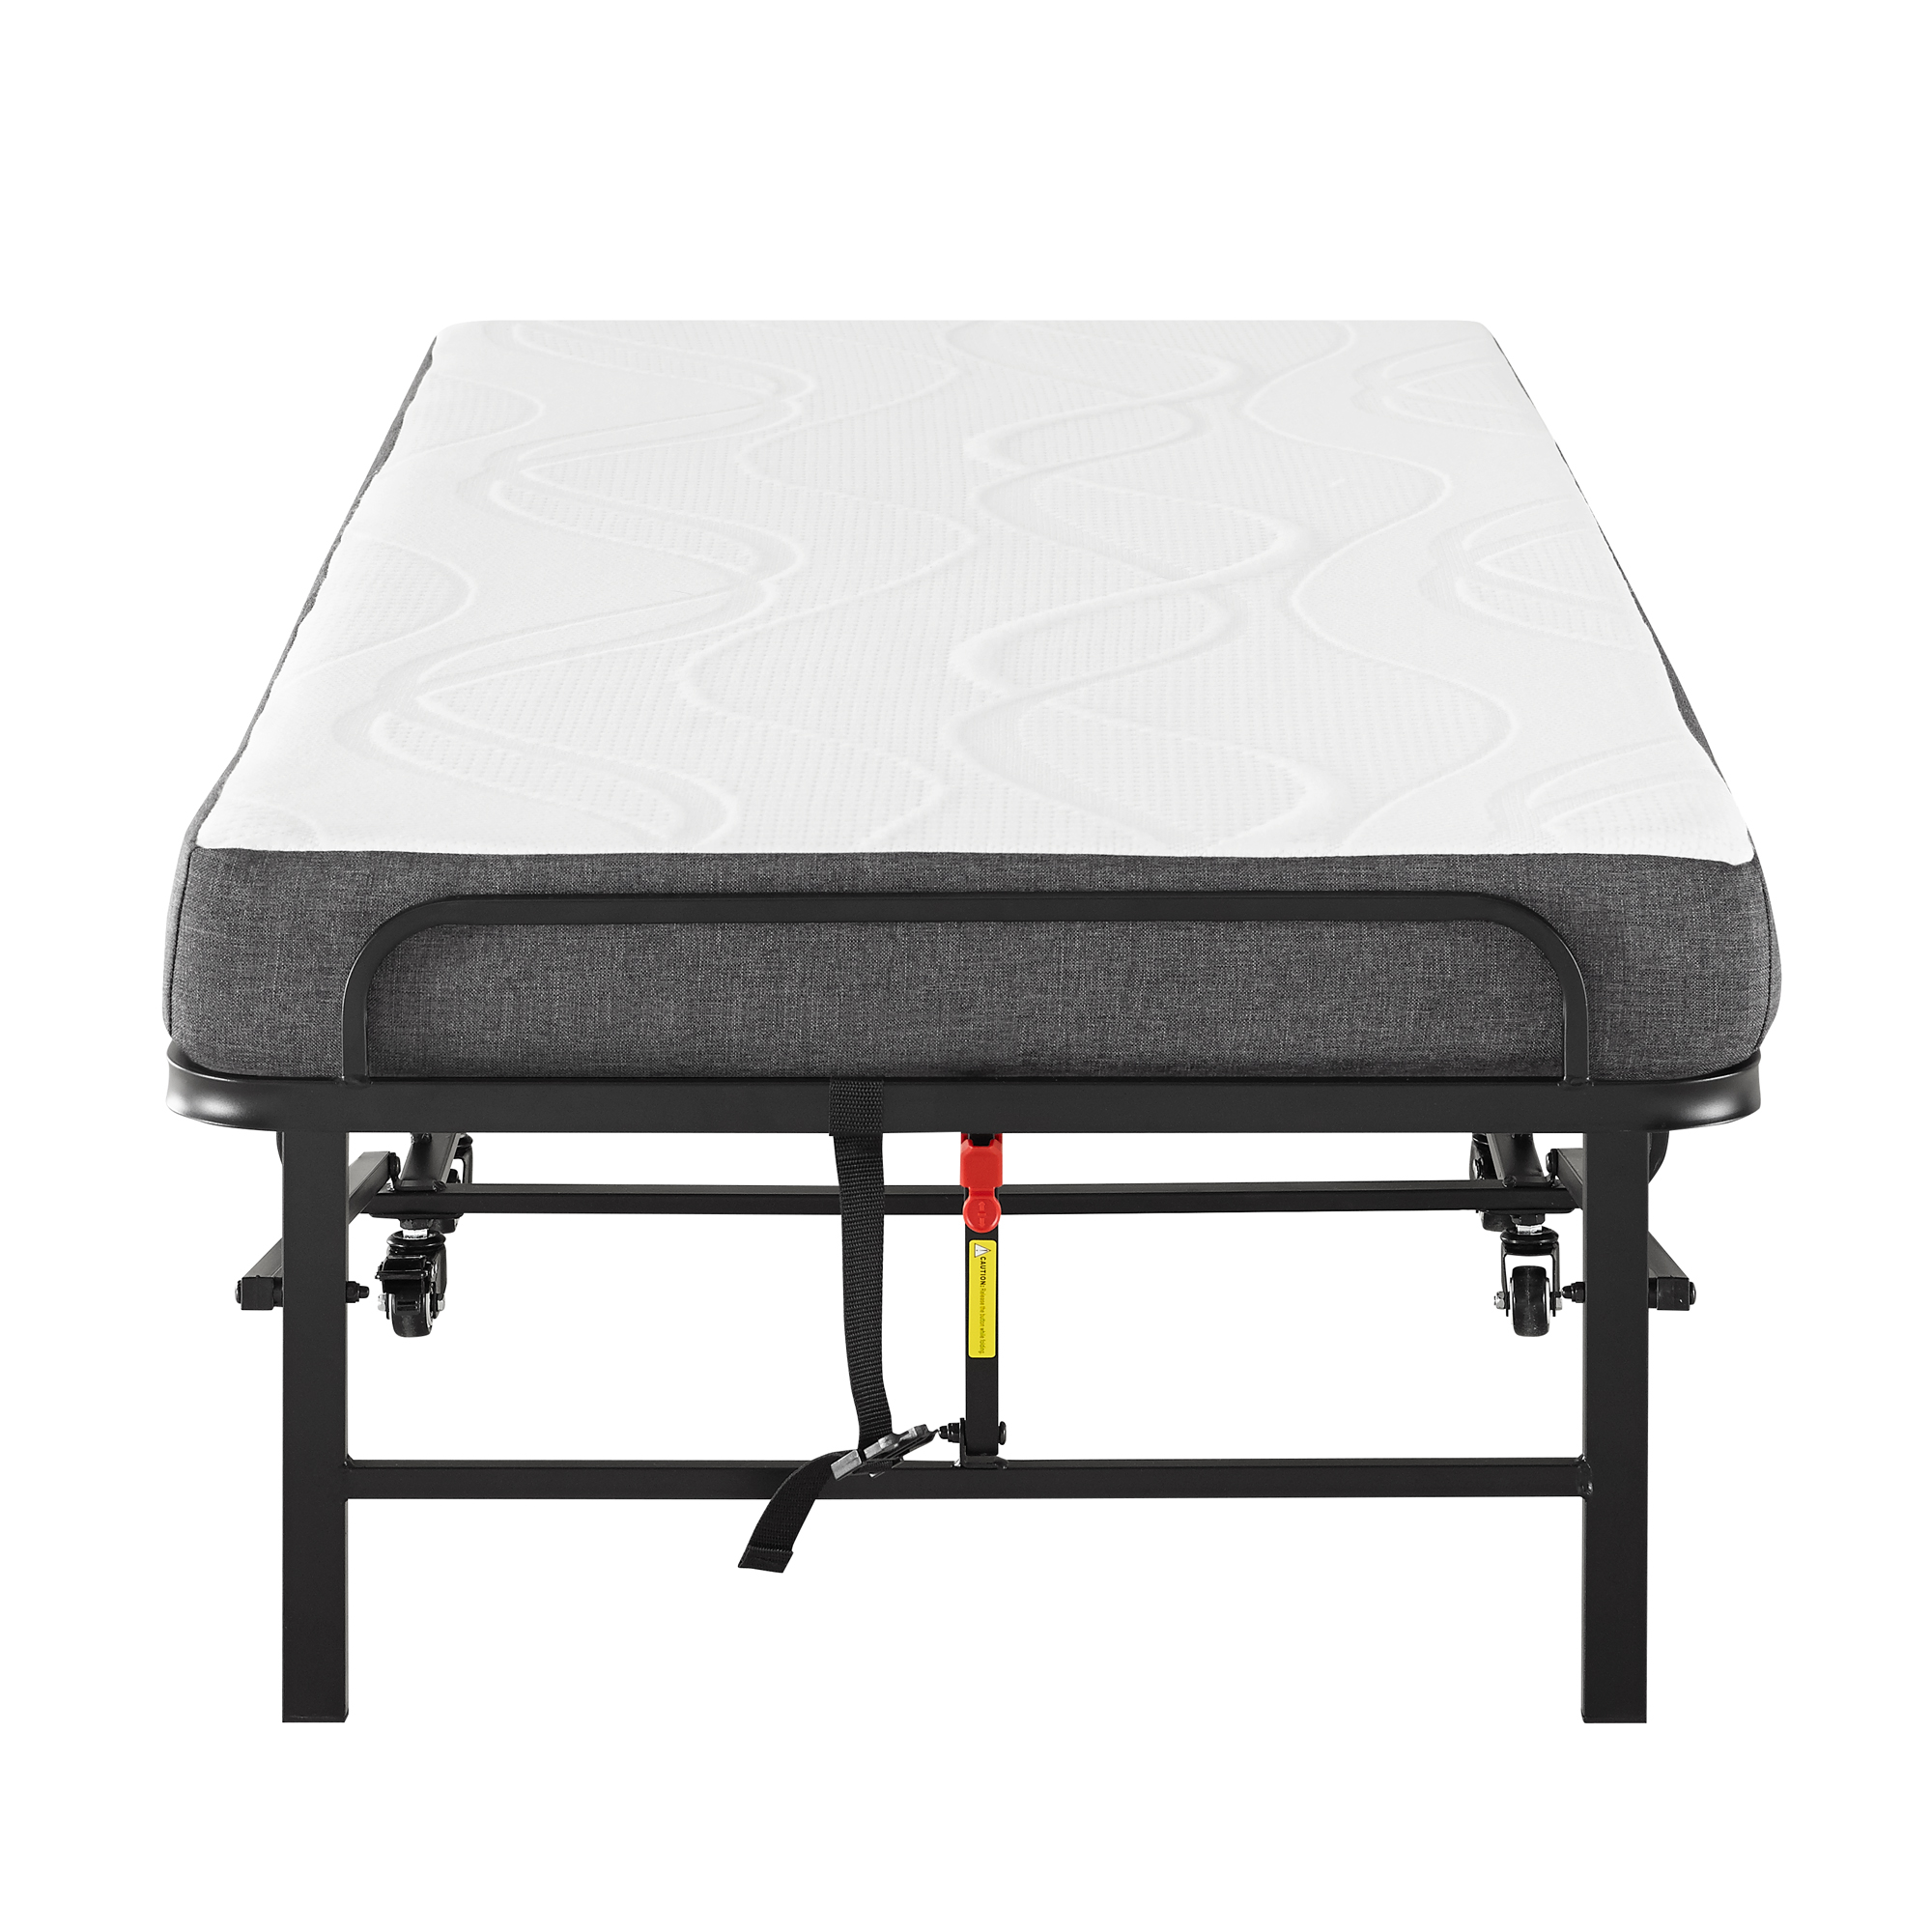 Modern Sleep Folding Rollaway Bed With 4 Inch Memory Foam Mattress Cot Walmart Com Walmart Com